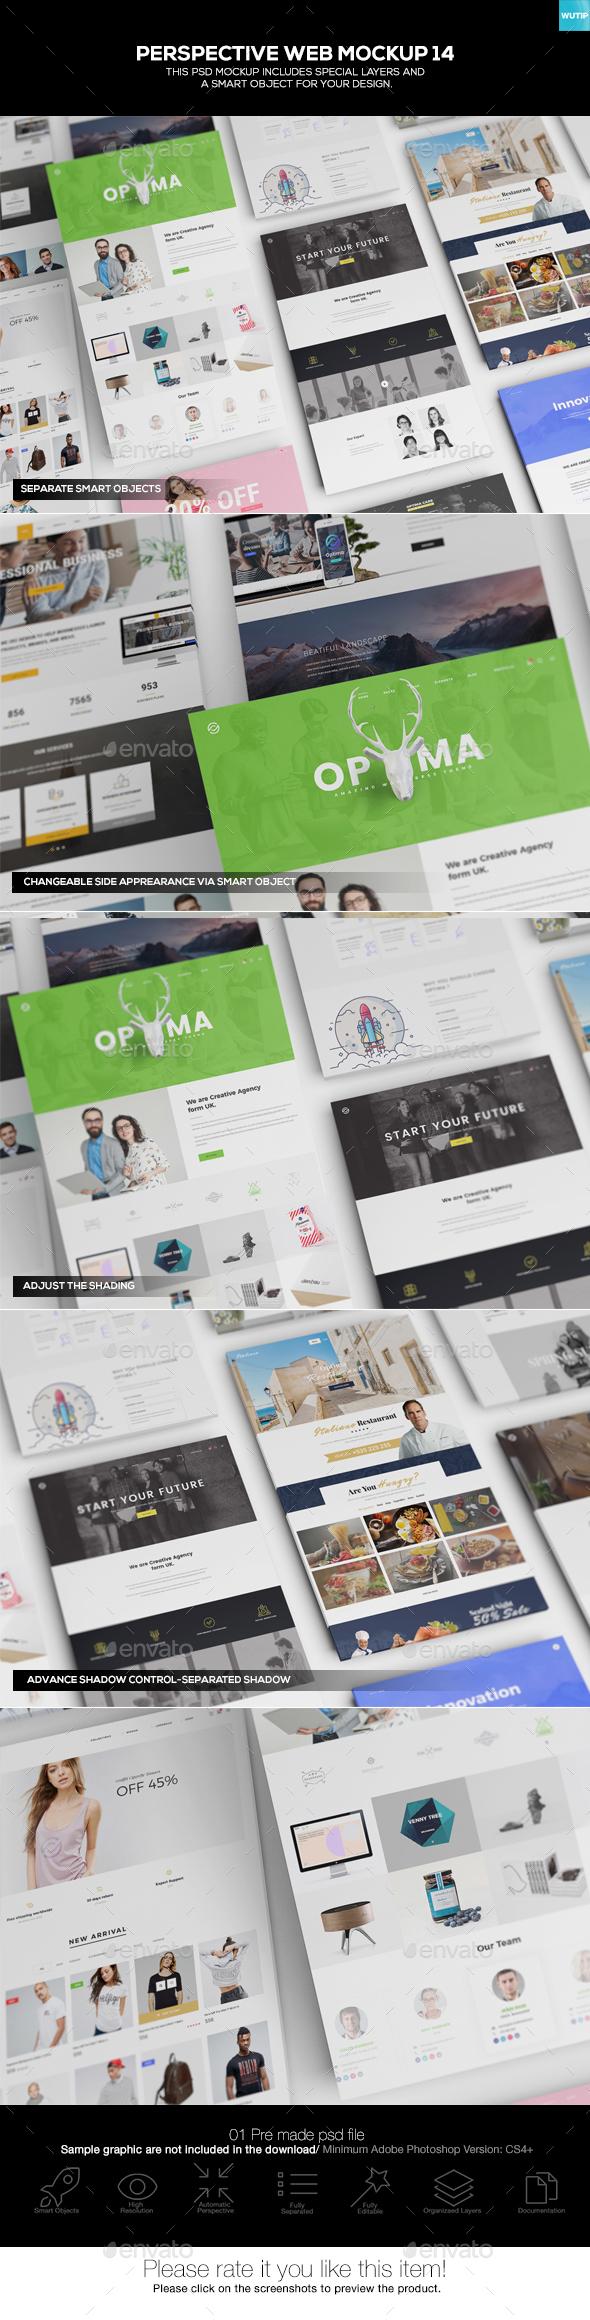 Perspective Web Mockup 14 - Website Displays